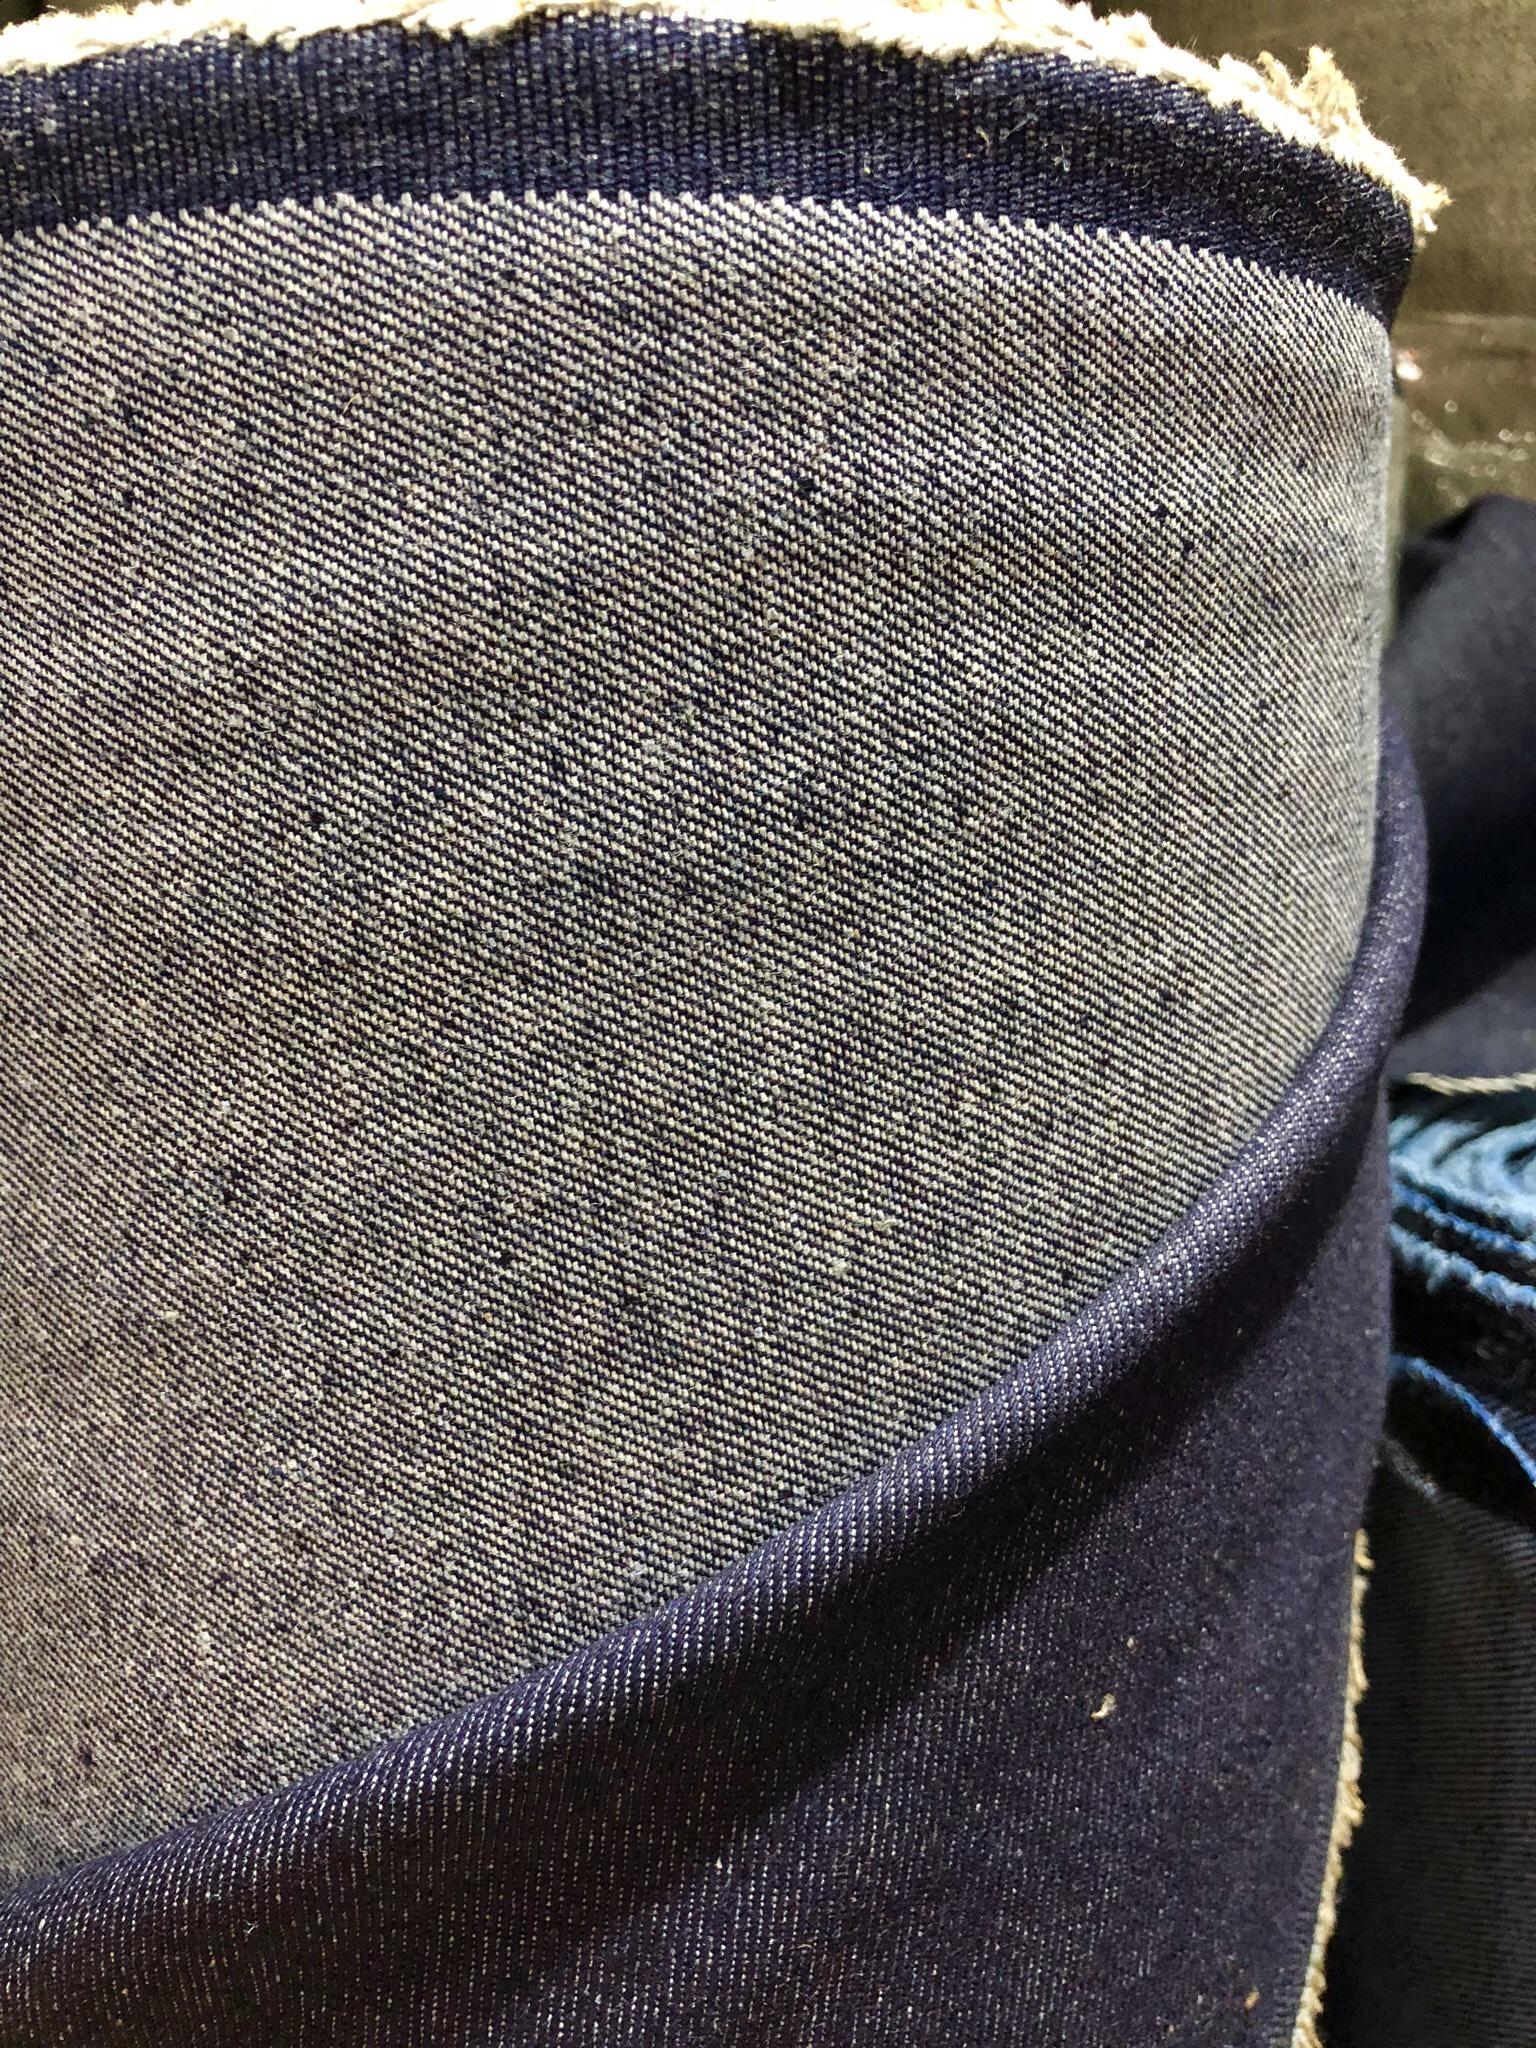 Vải jean cotton 10×7, khổ 1m60